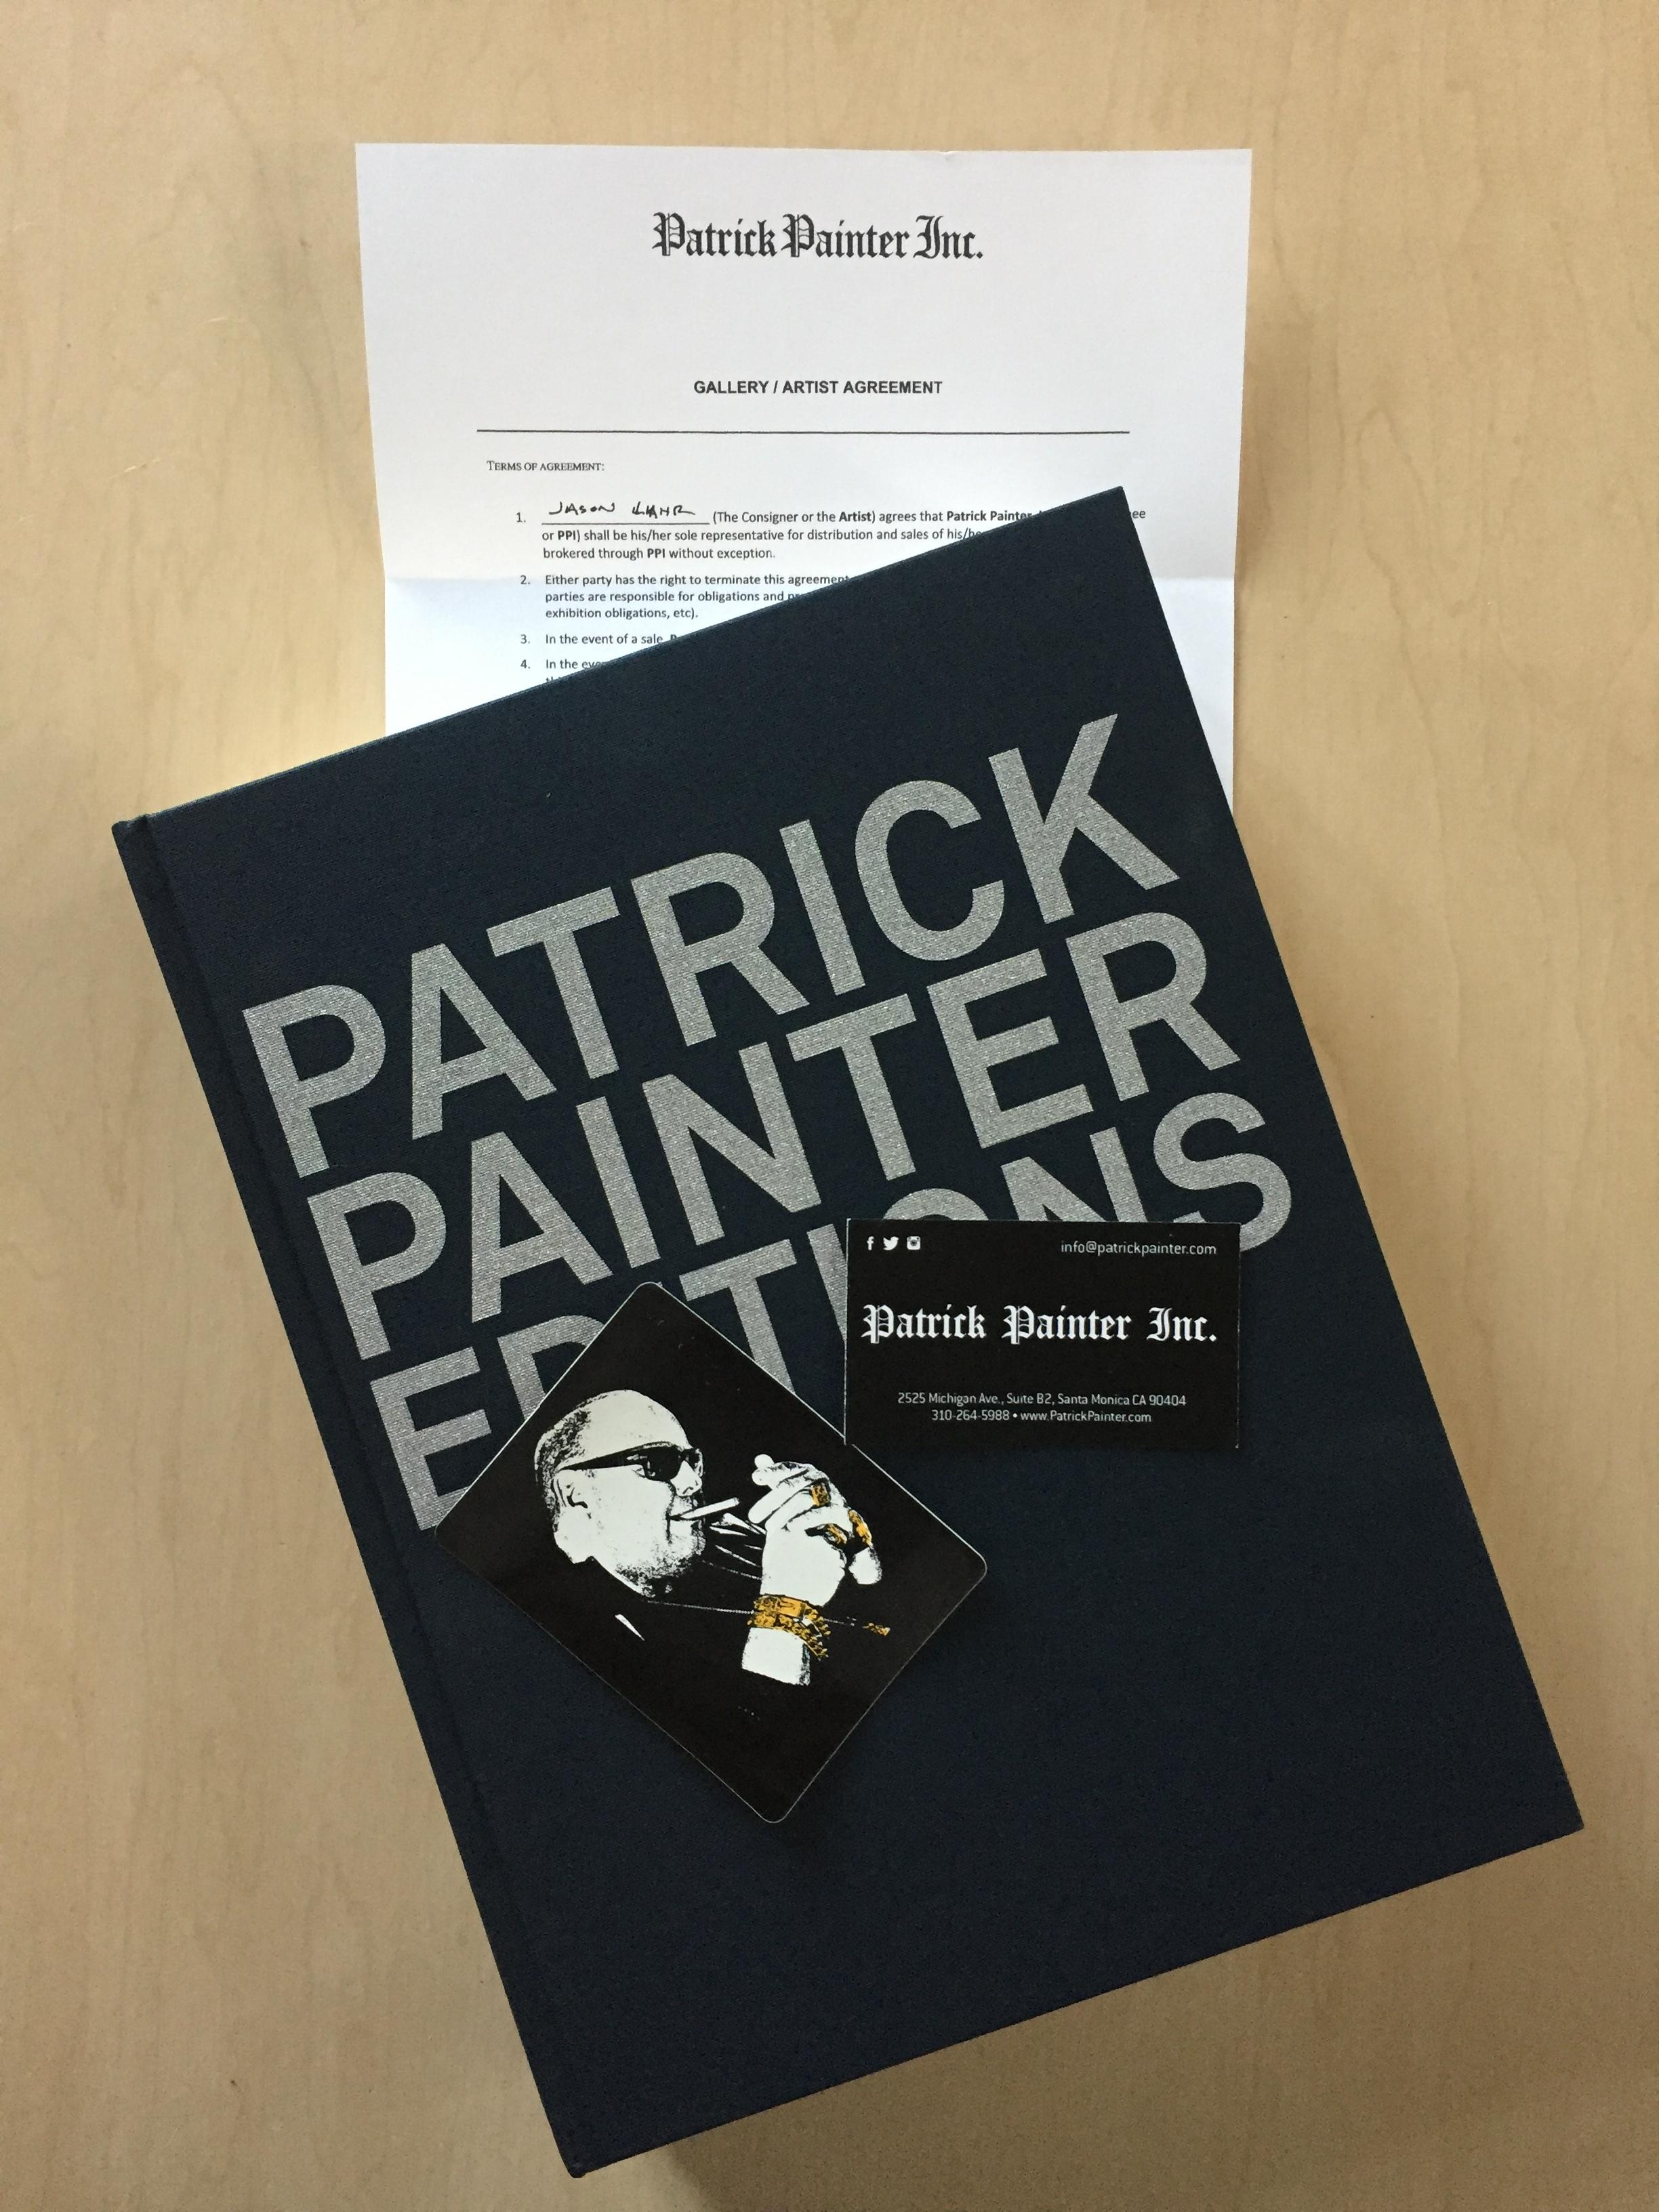 Epic  Patrick Painter Editions  catalog and other ephemera